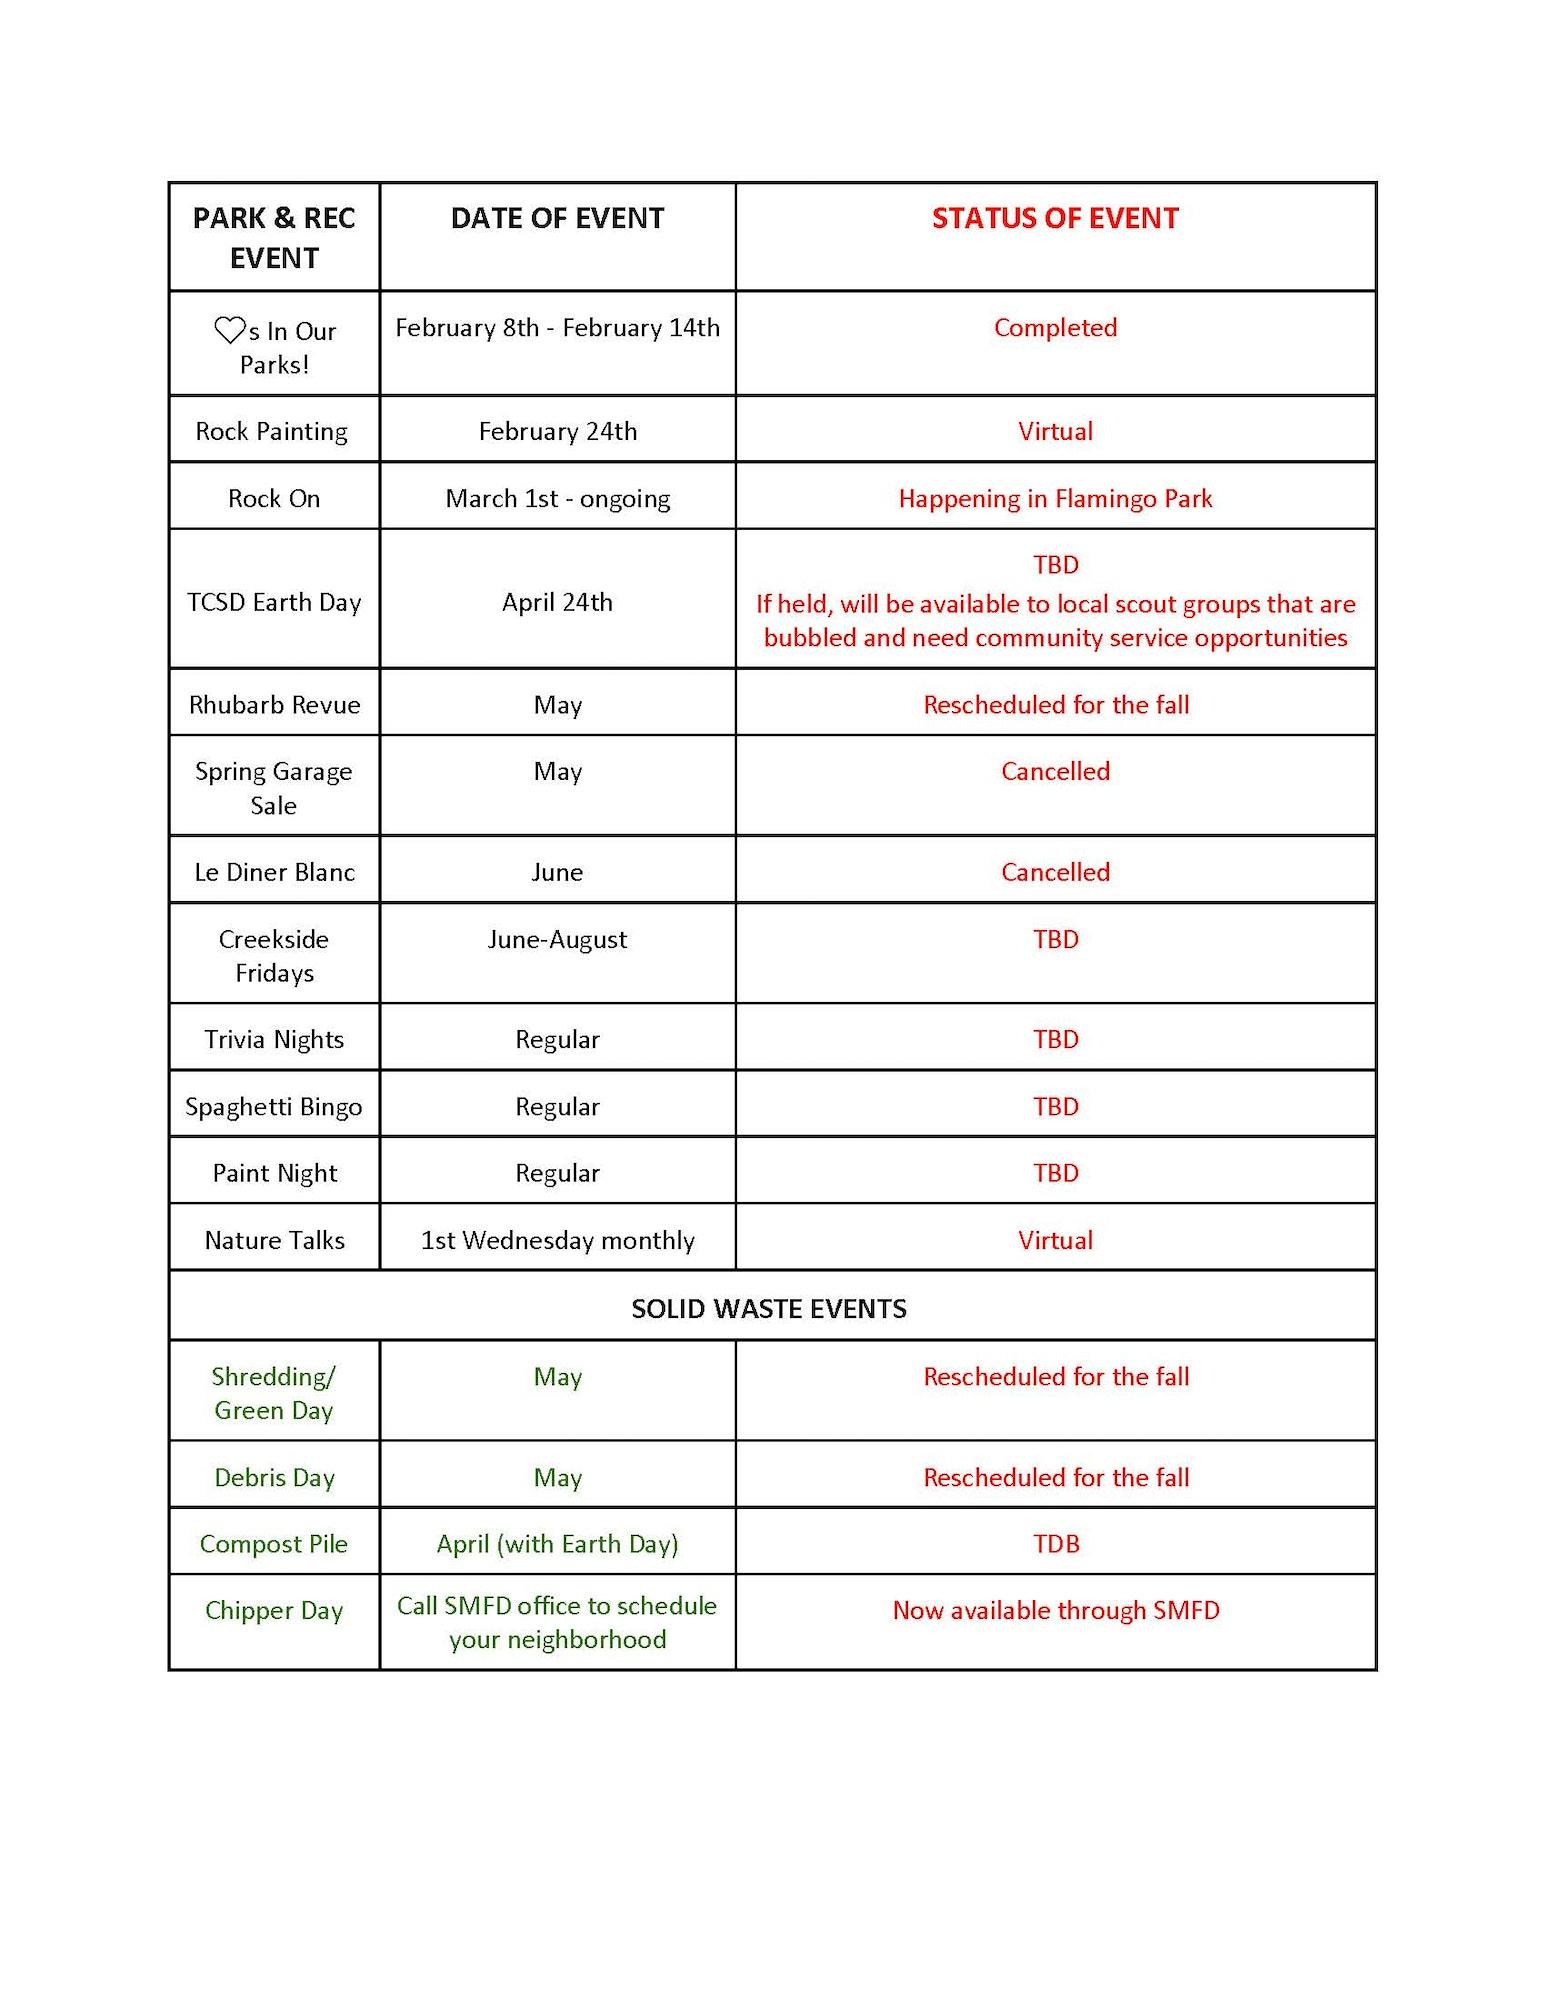 May contain: plot, text, number, symbol, and menu